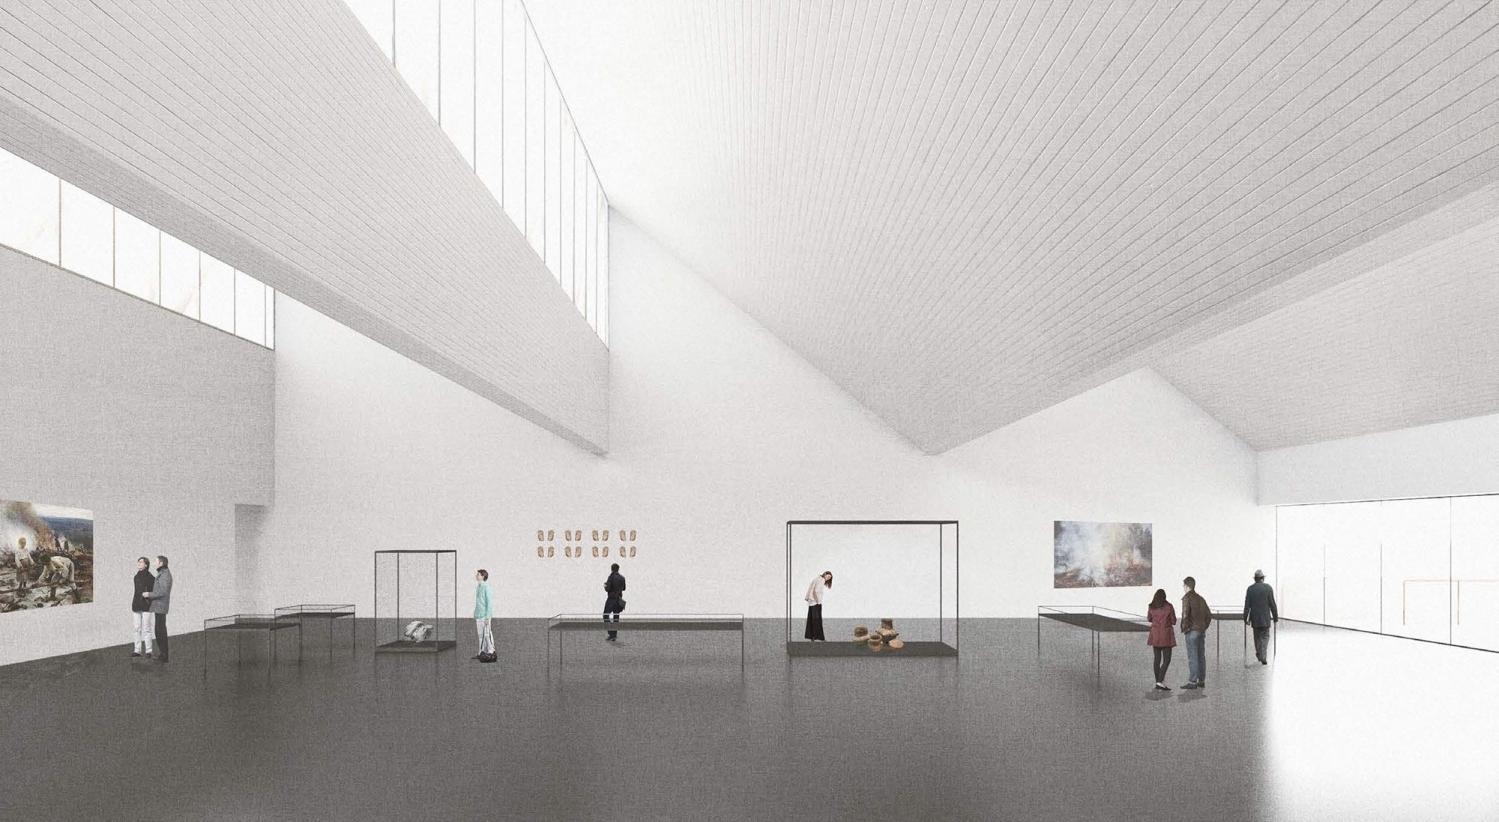 X01-entry-.-Skogfinsk-Museum-.-Svullrya-4.jpg